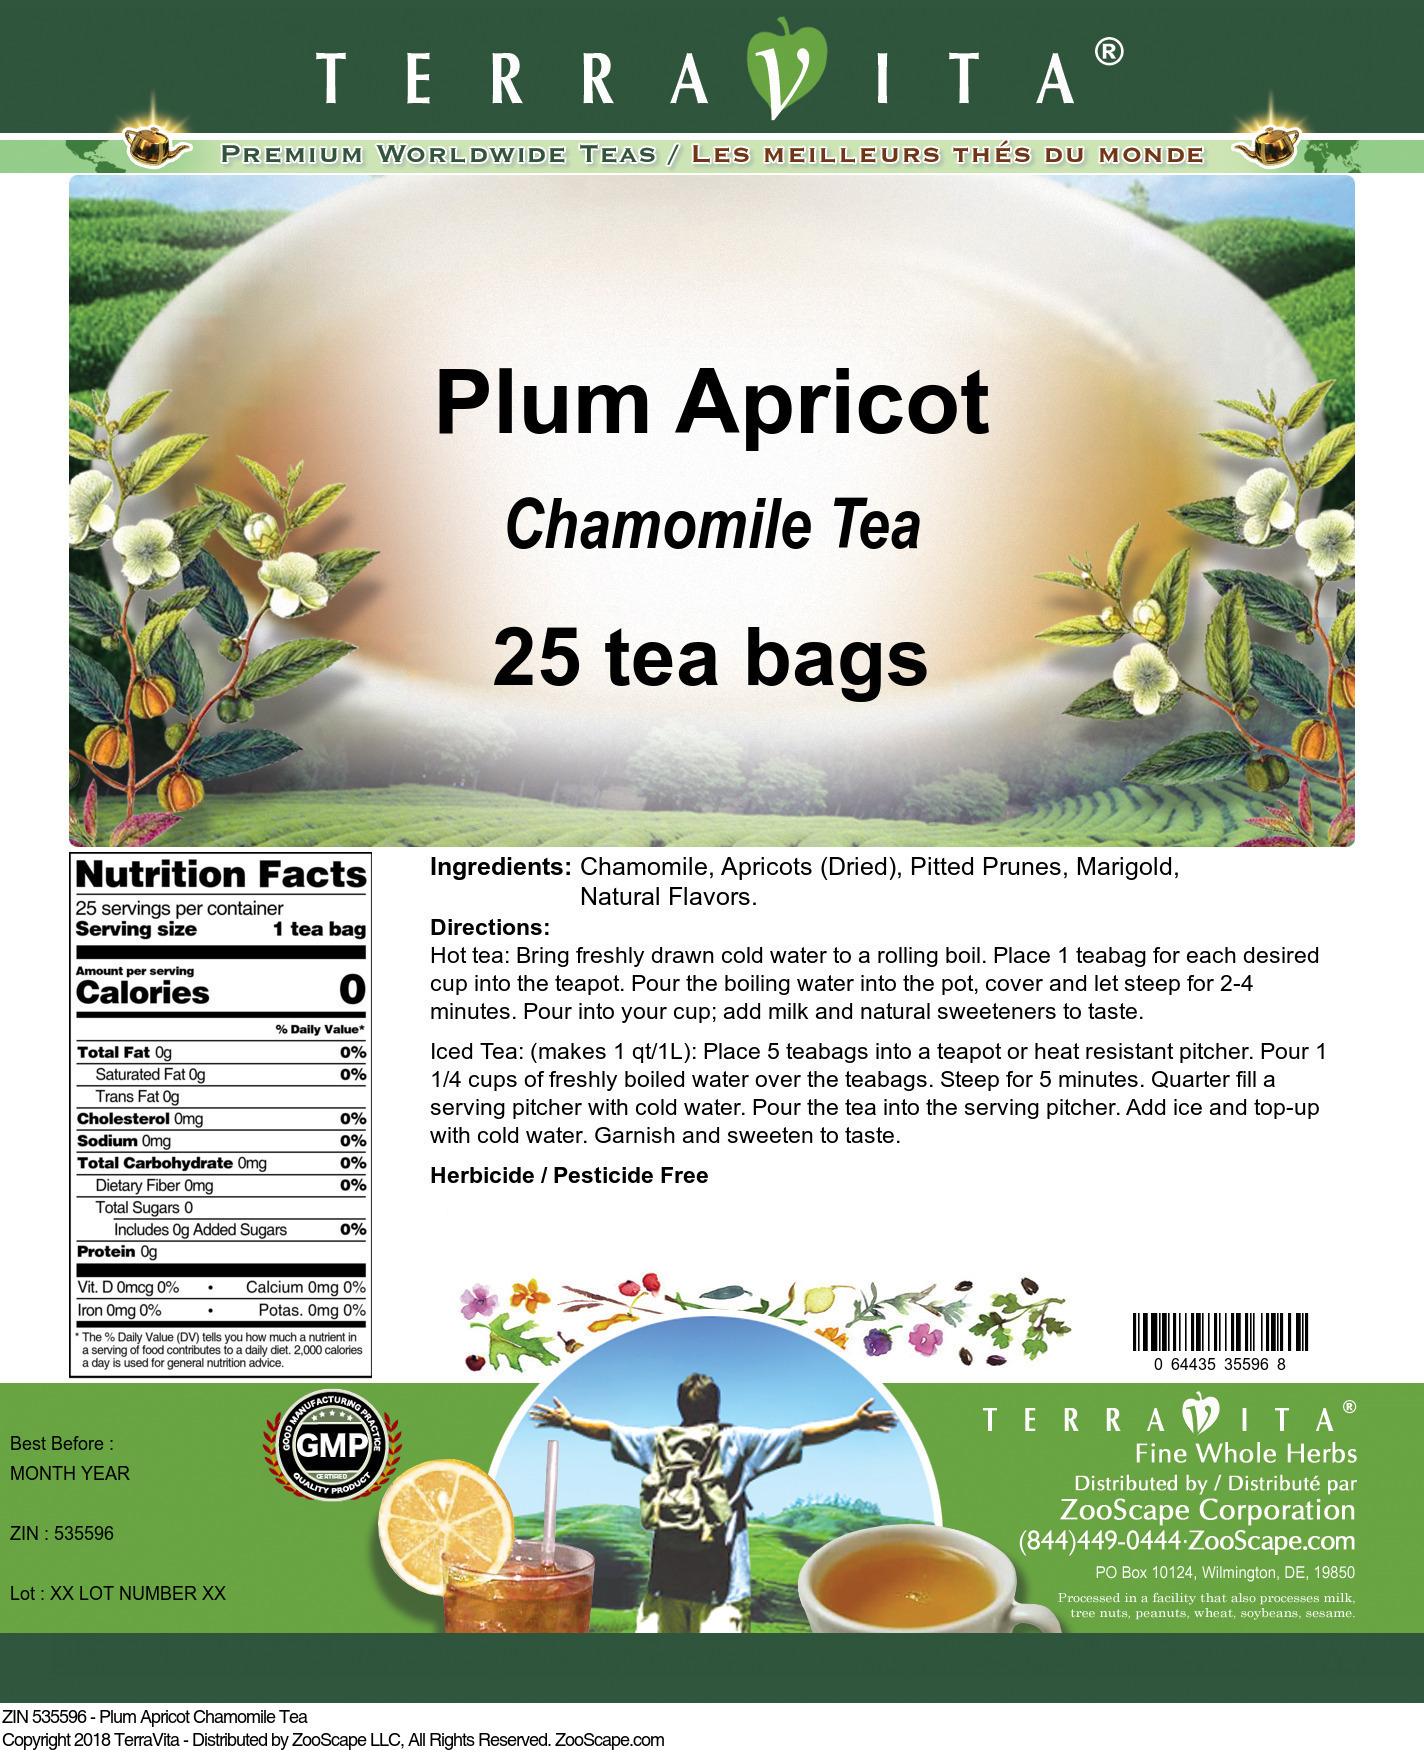 Plum Apricot Chamomile Tea